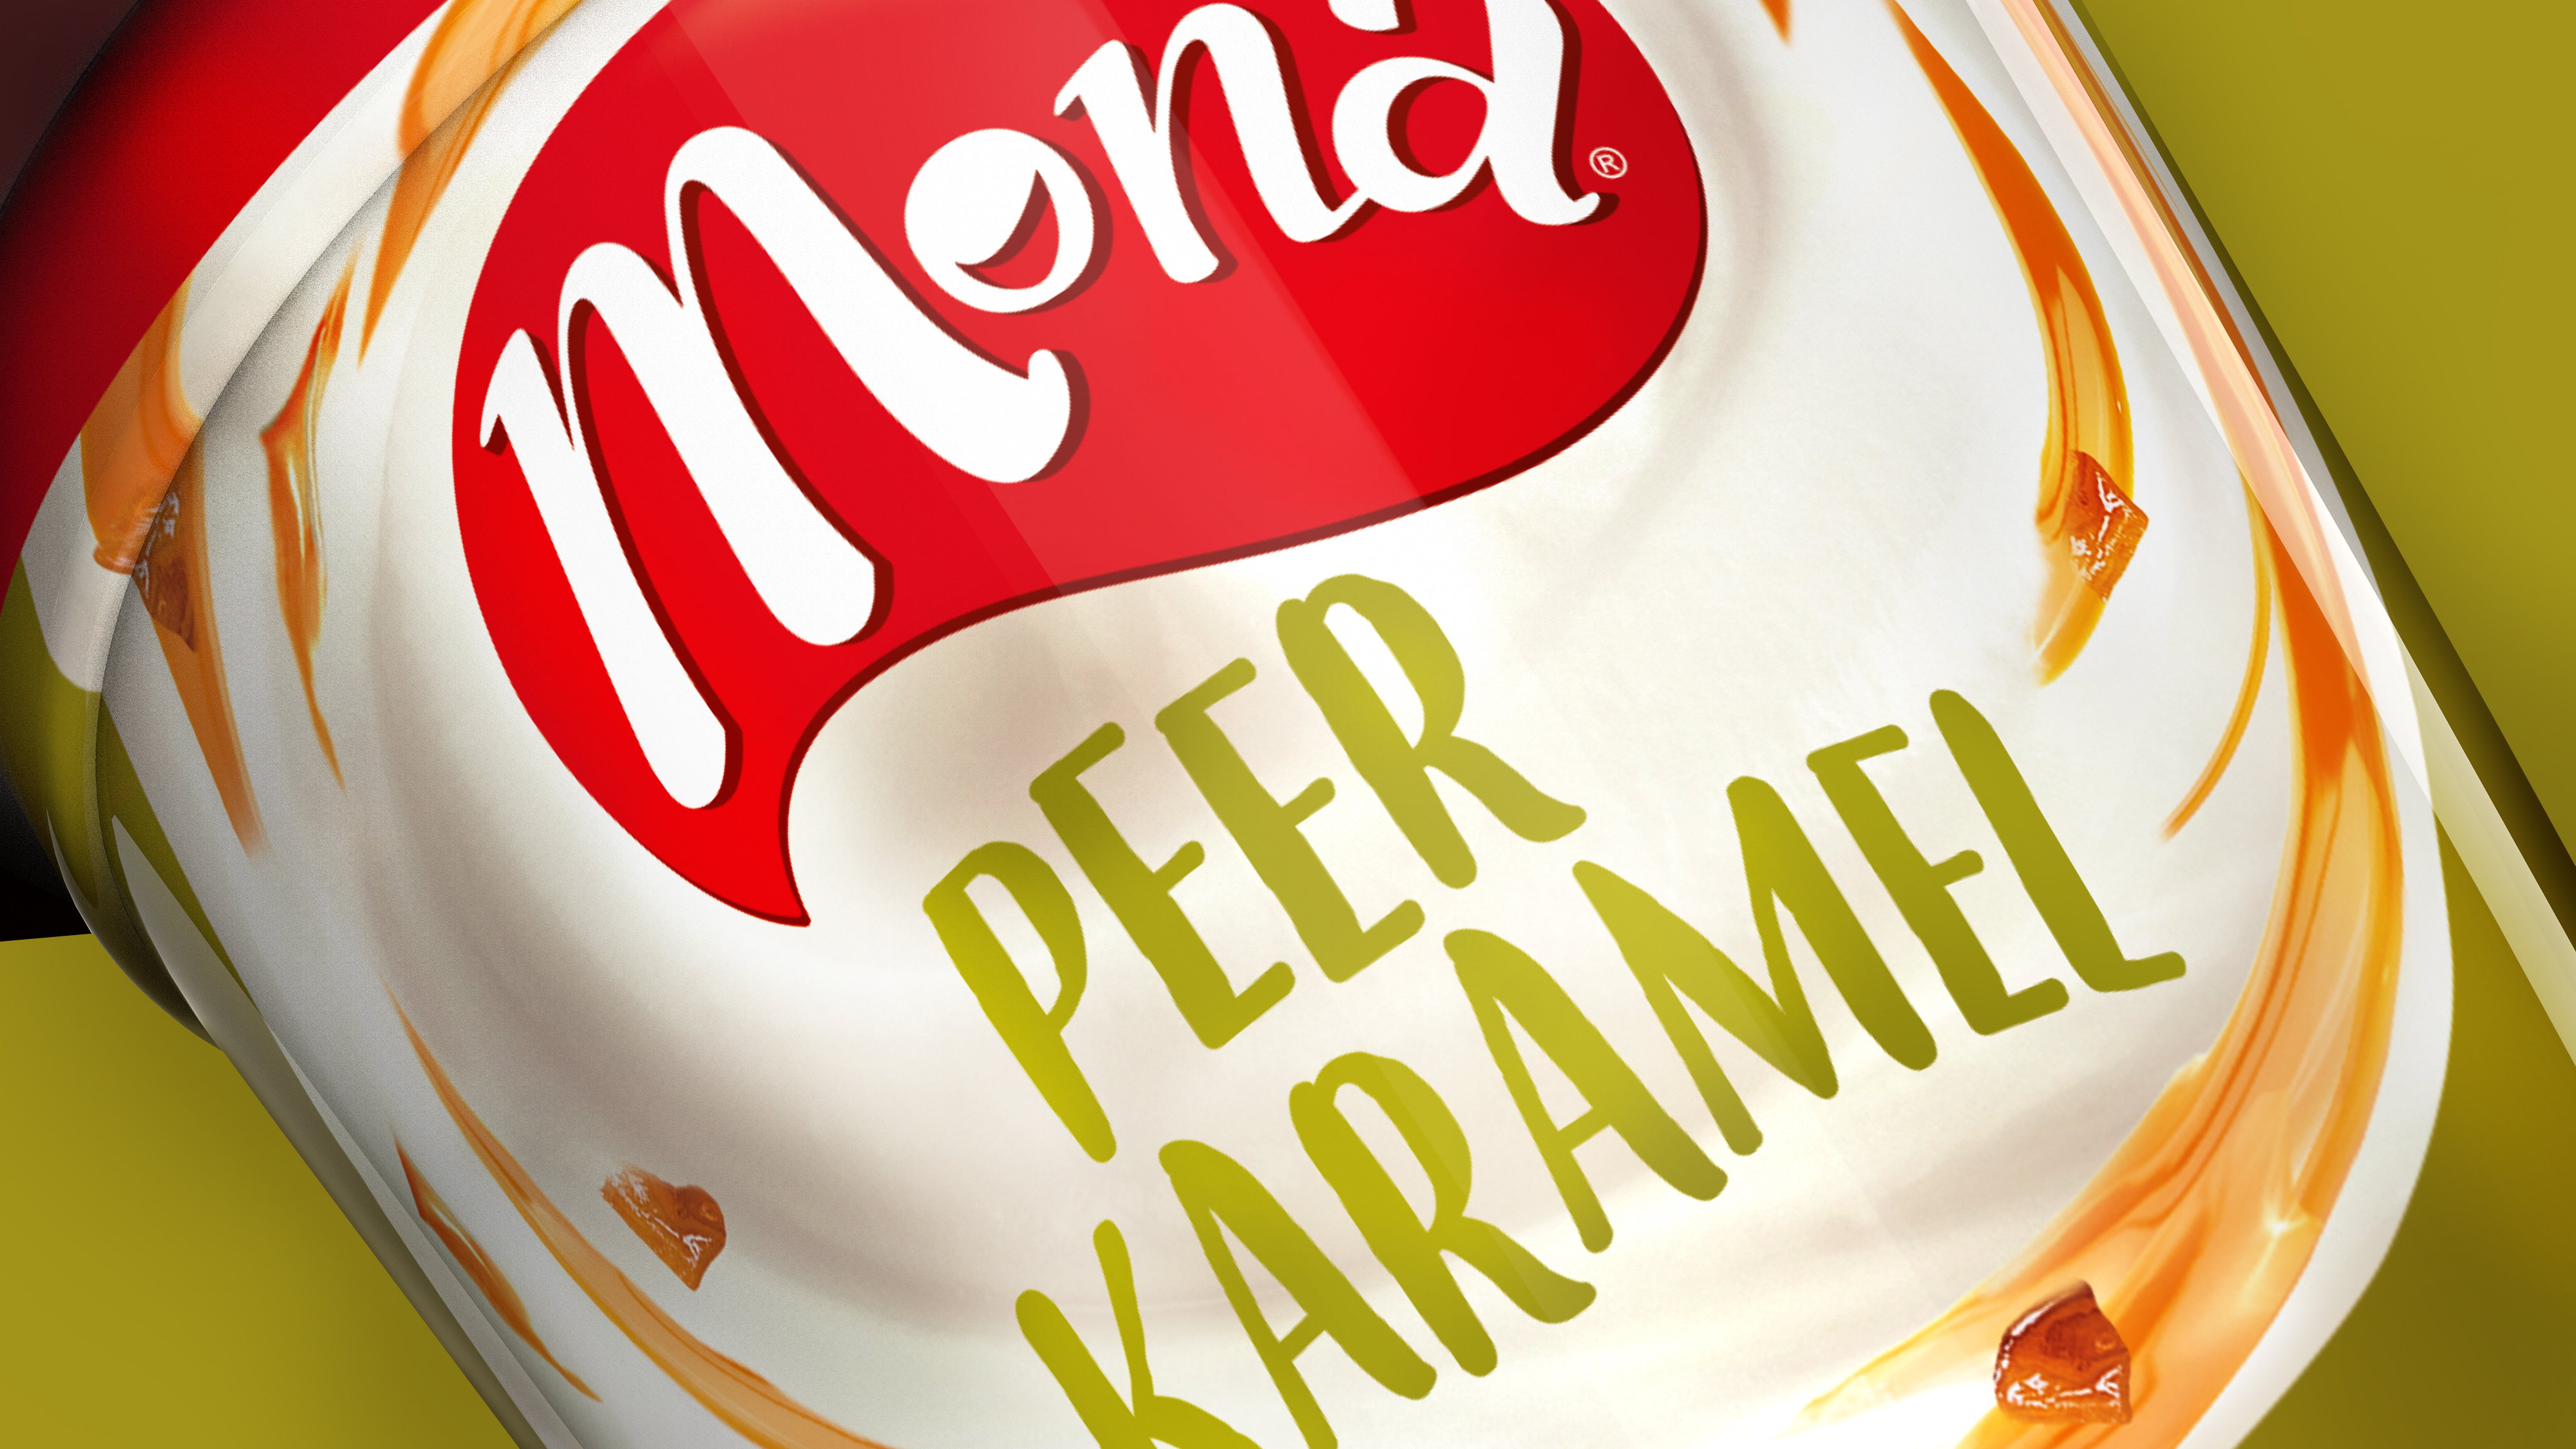 Mona yoghurt dessert packaging design close up